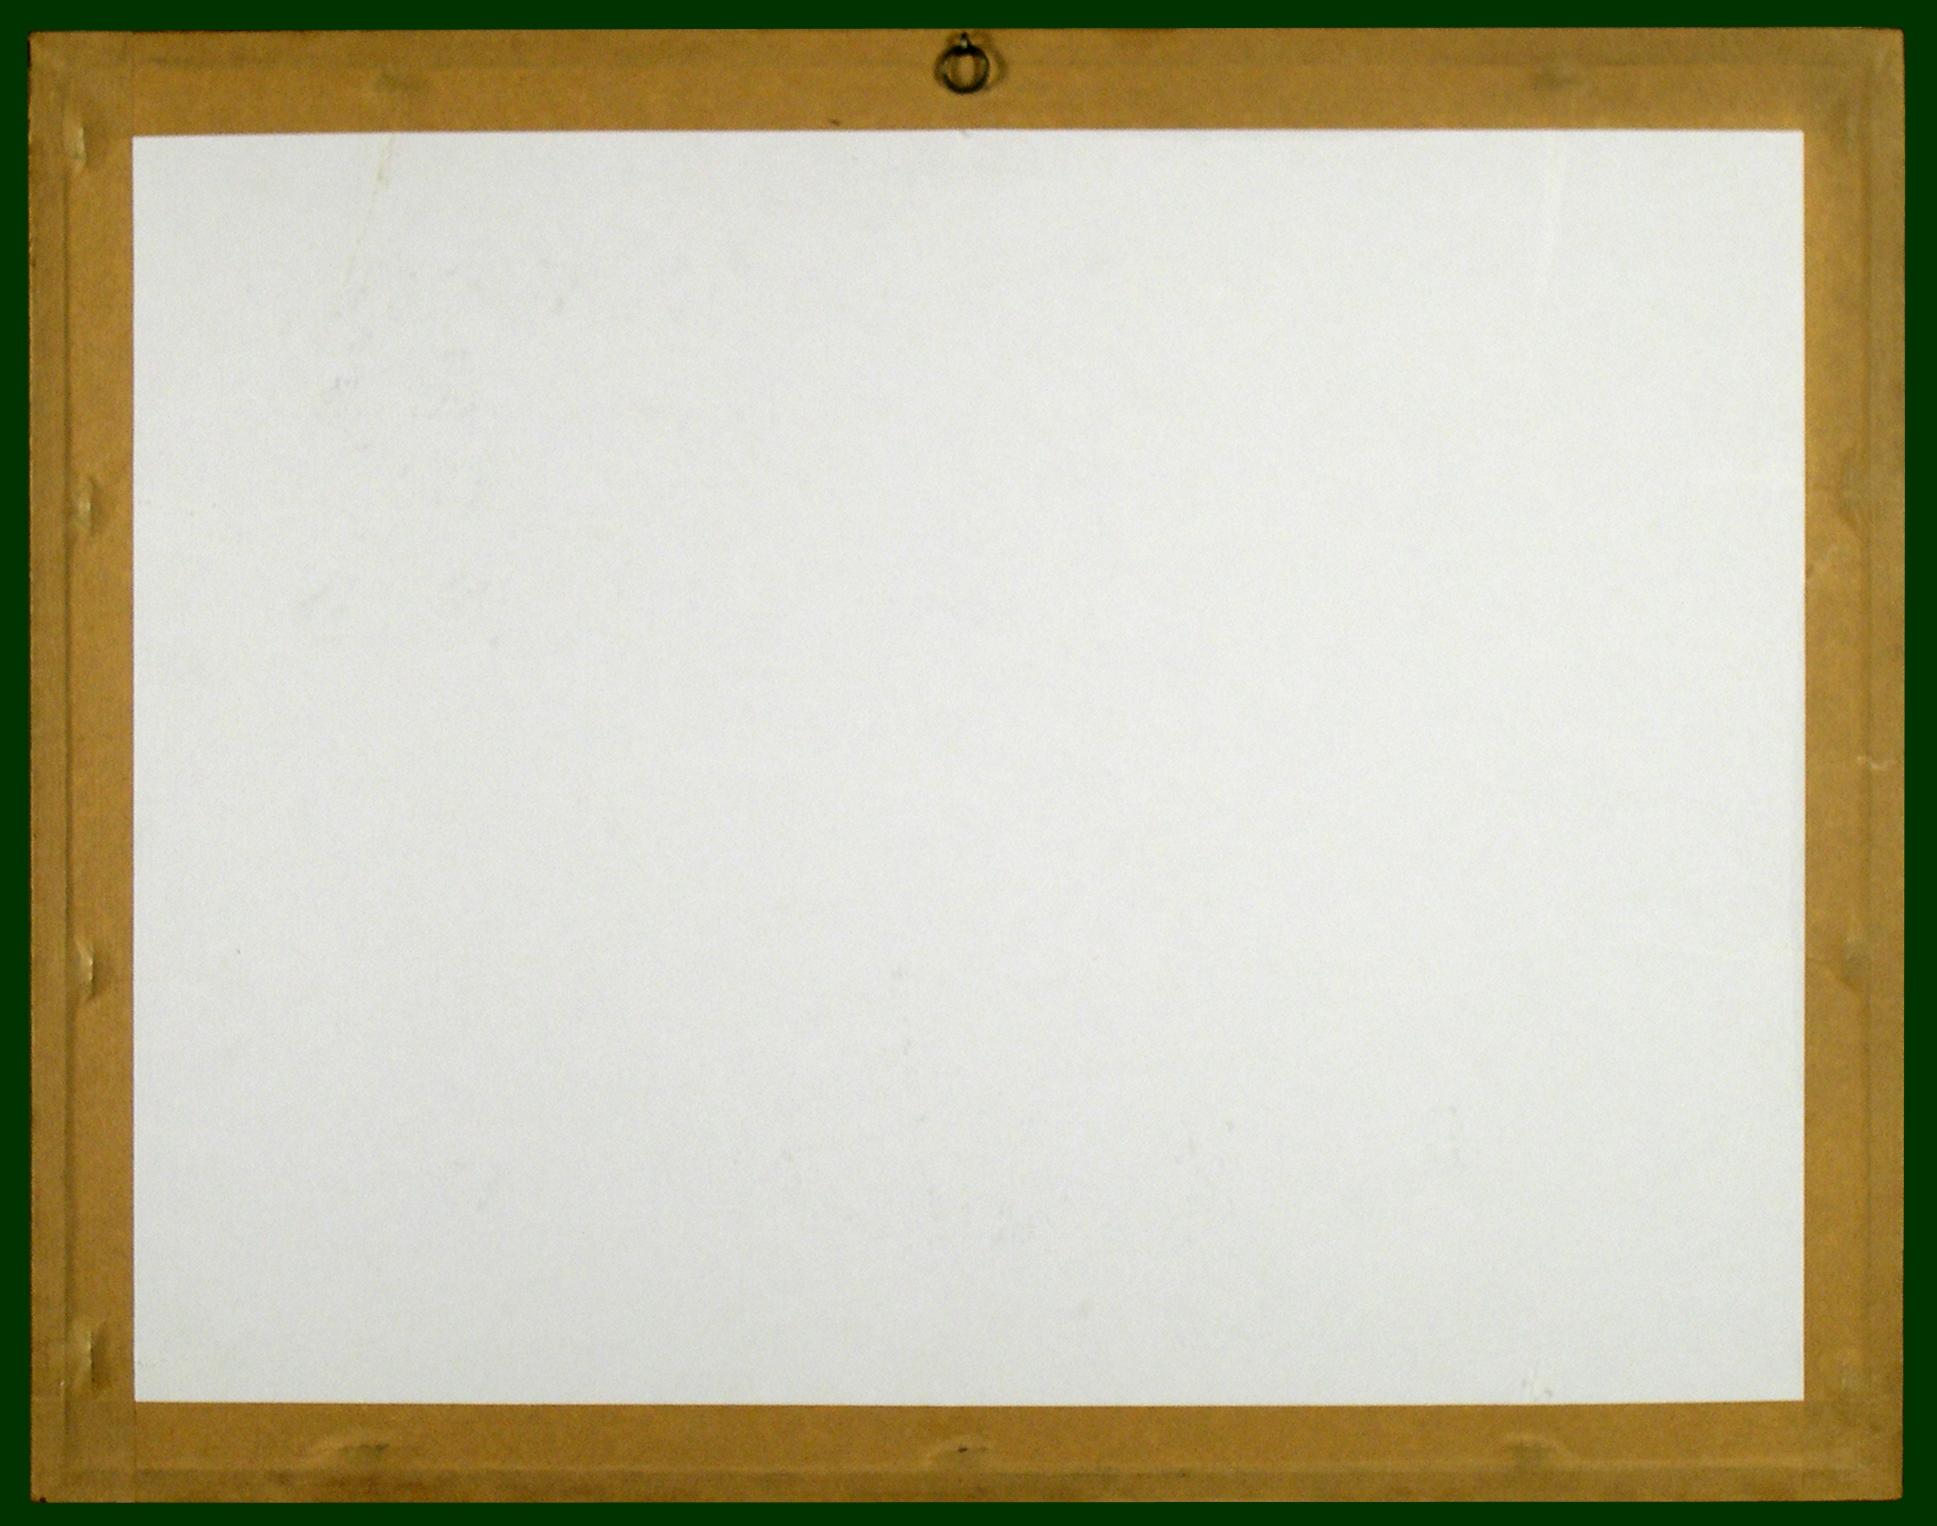 57-8h_t.JPG (1937�1526)